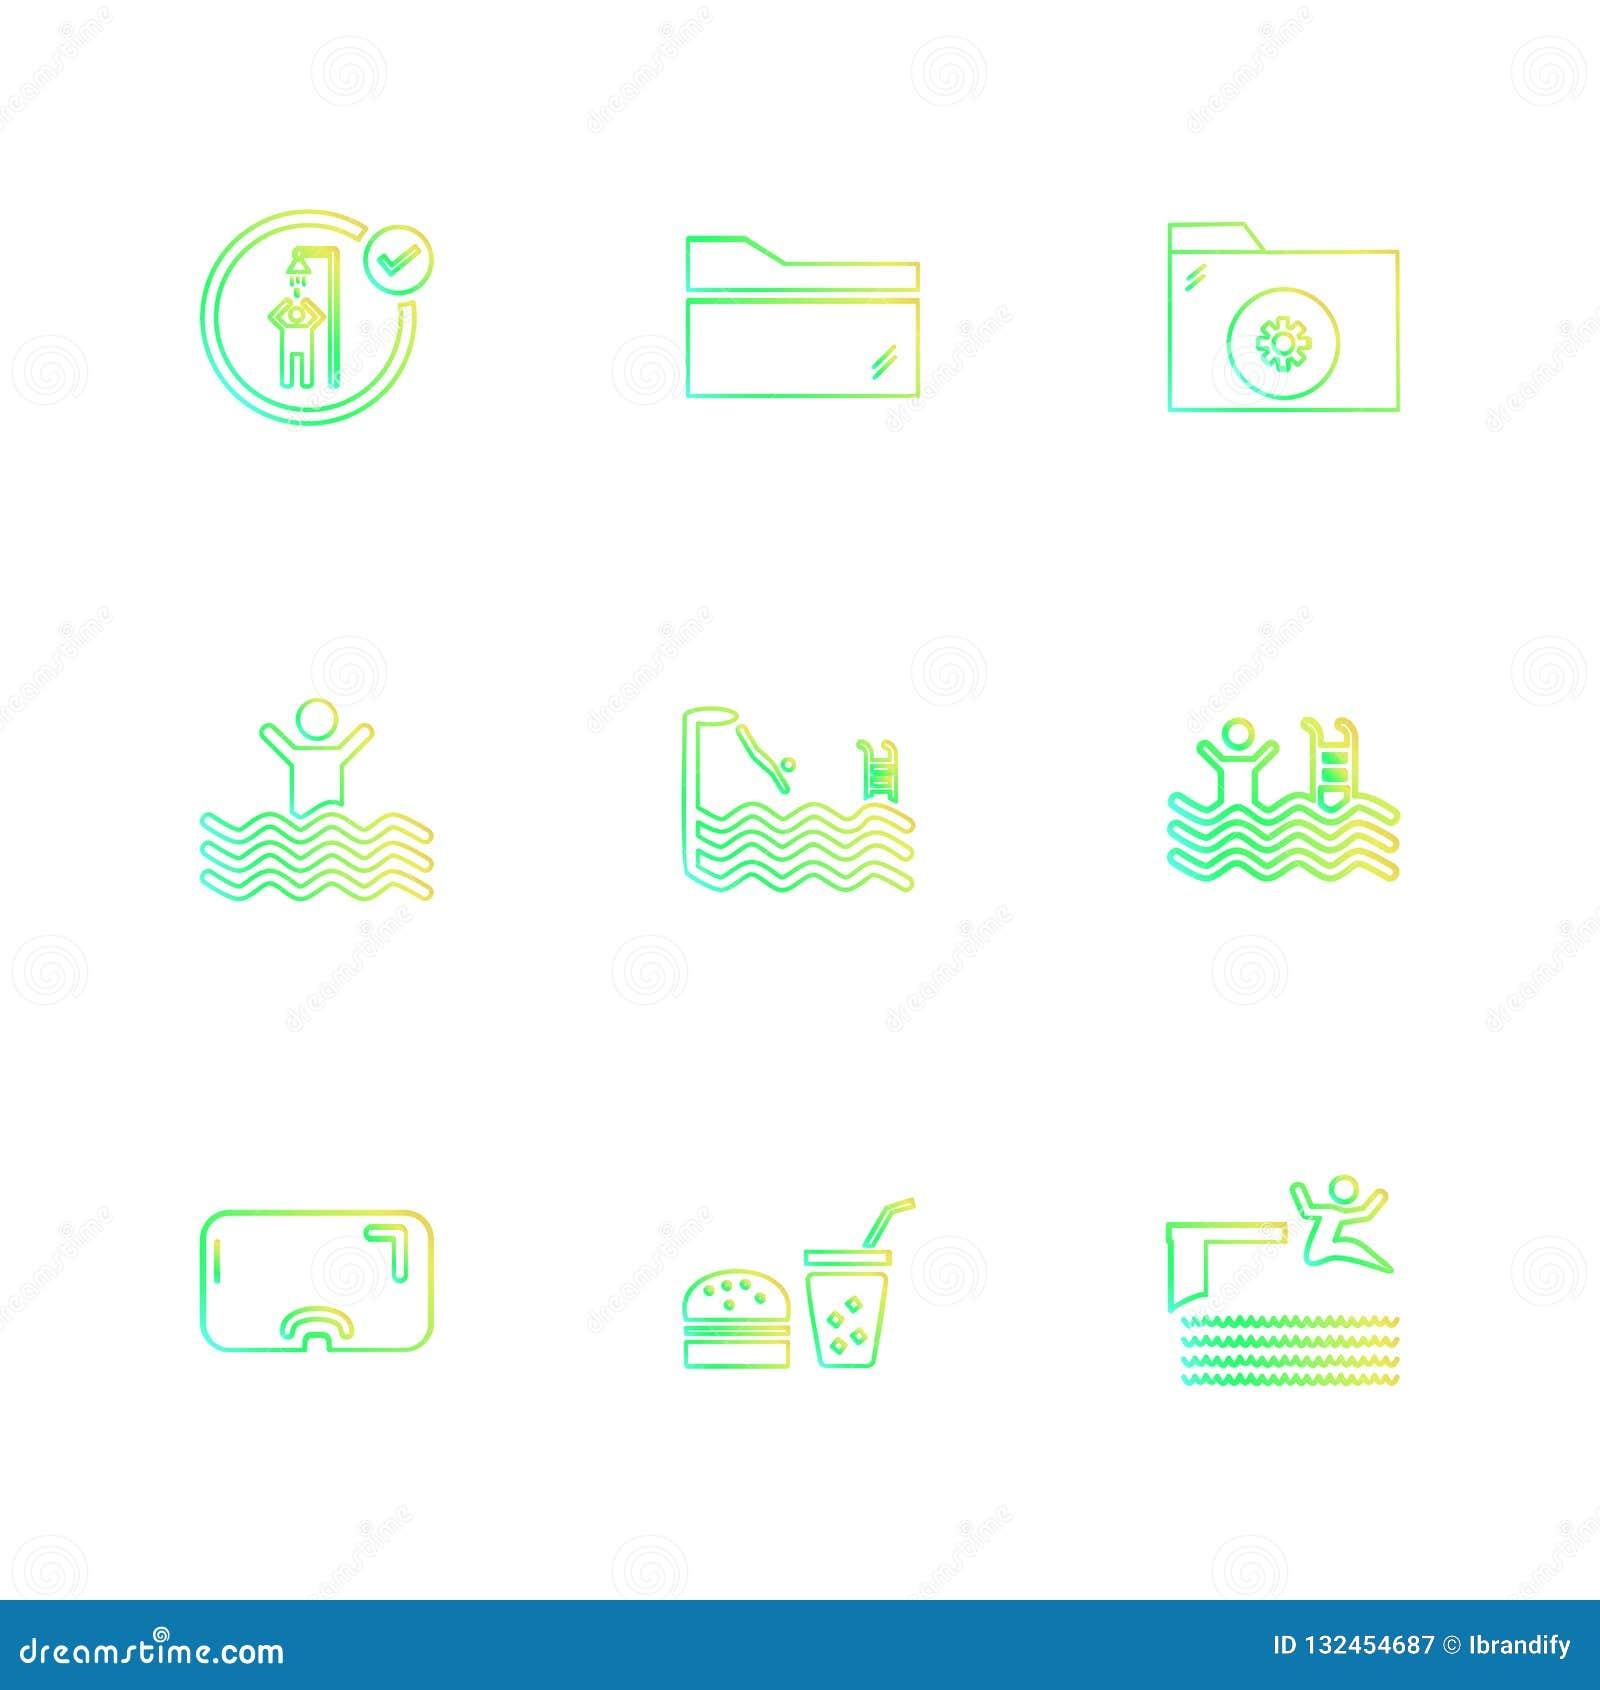 Ordner, Dateien, Sommer, Strand, Picknick, Getränke, ENV-Ikonen eingestellt